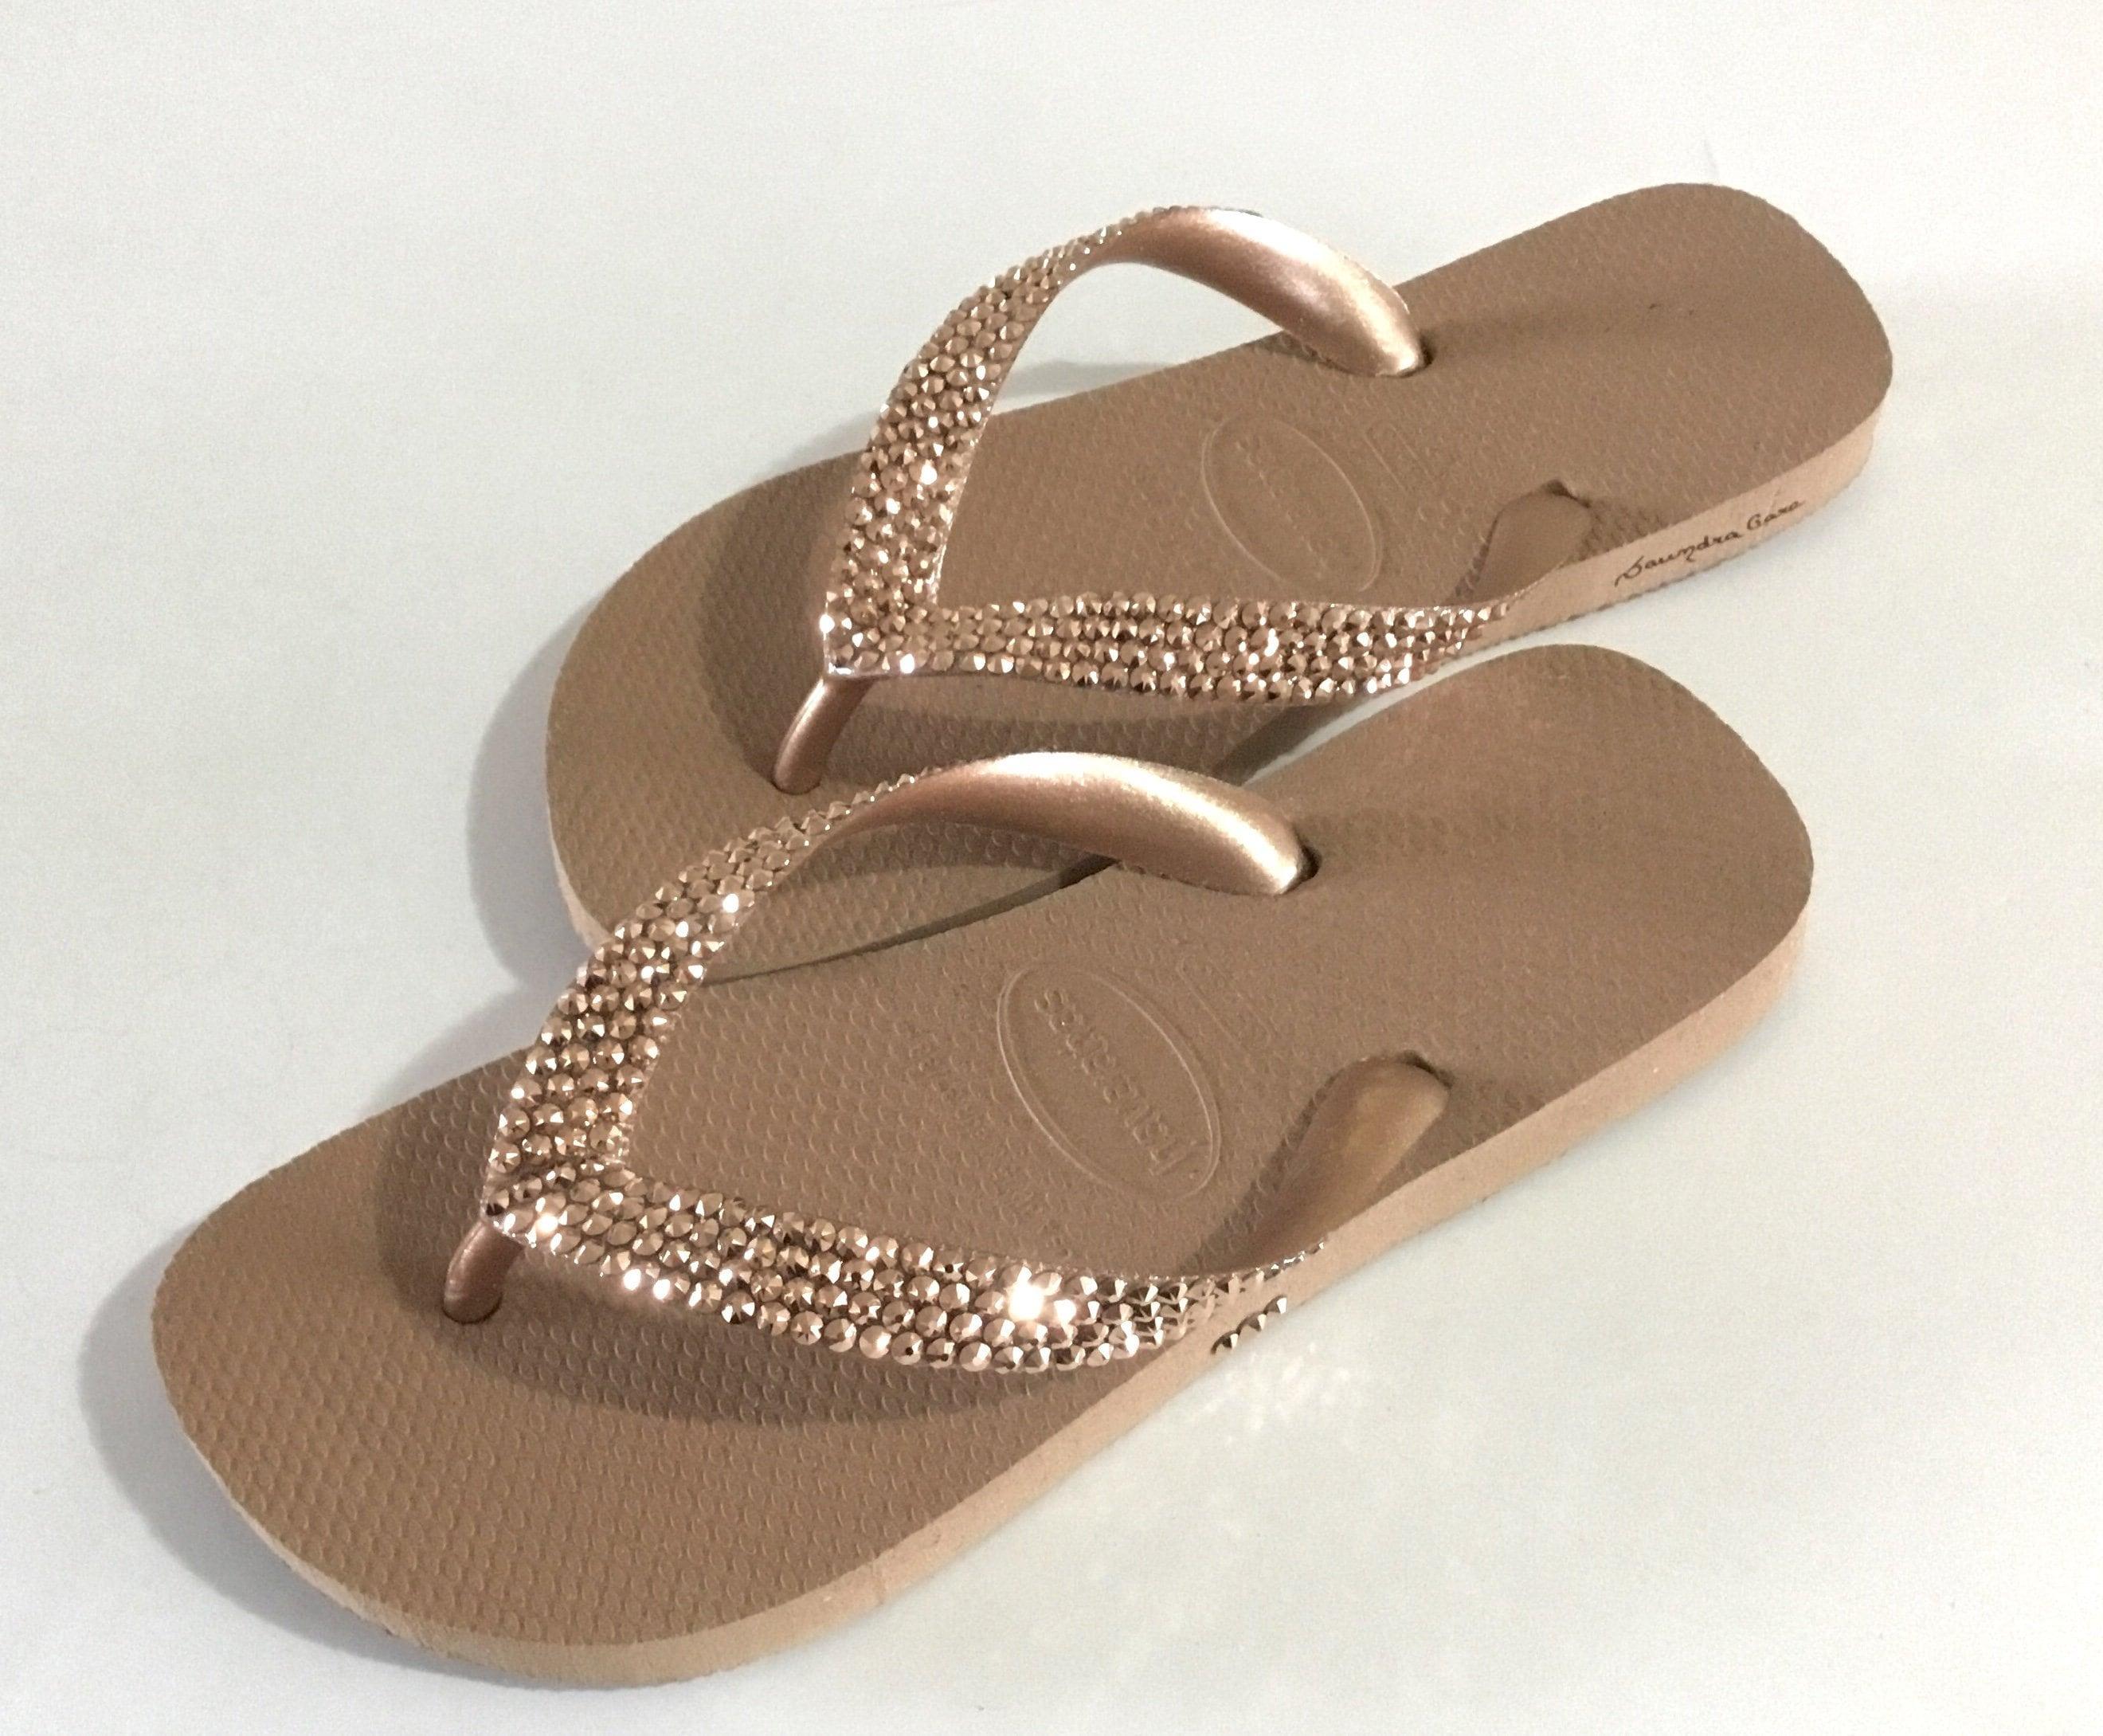 972d9df3a Rose Gold Flip Flops Custom Crystal Flat Havaianas Metallic